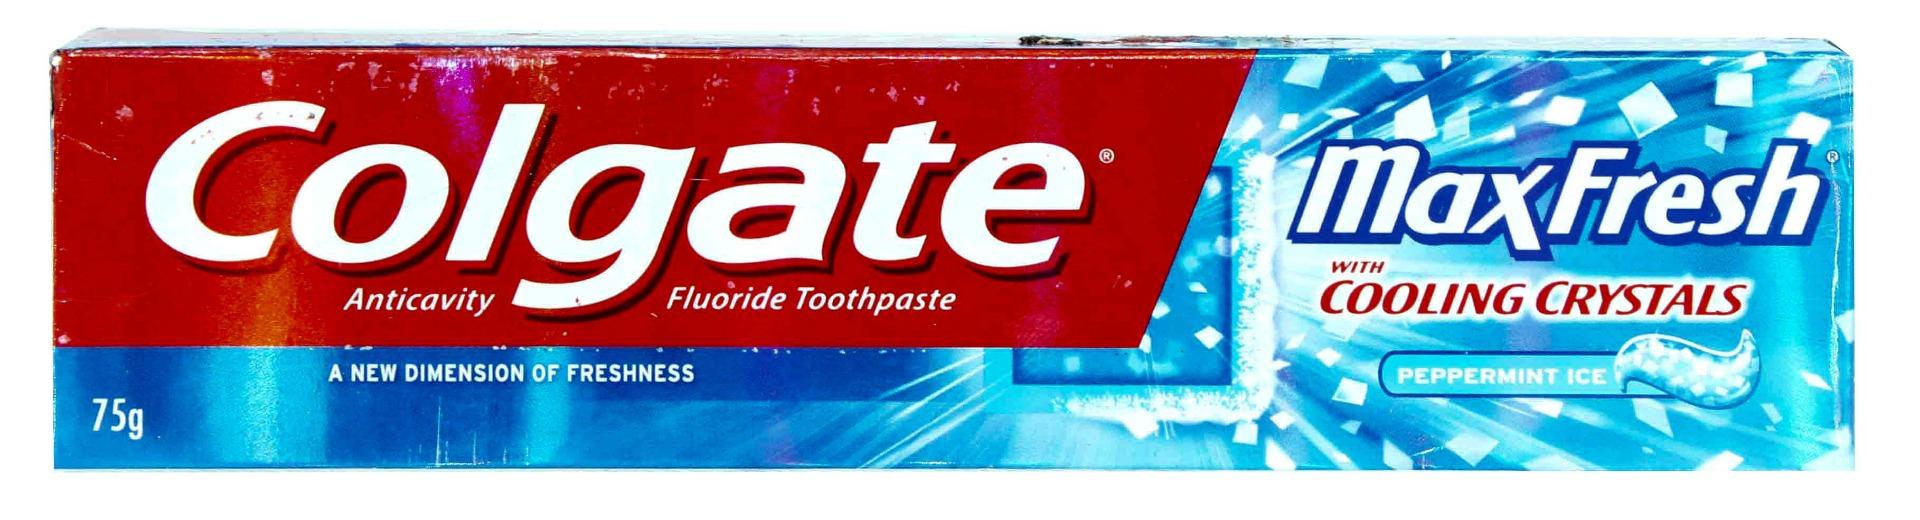 colgate max fresh Colgate max fresh toothpaste - cool mint, 19oz colgate max fresh with whitening toothpaste cool mint anticavity fluoride toothpaste.